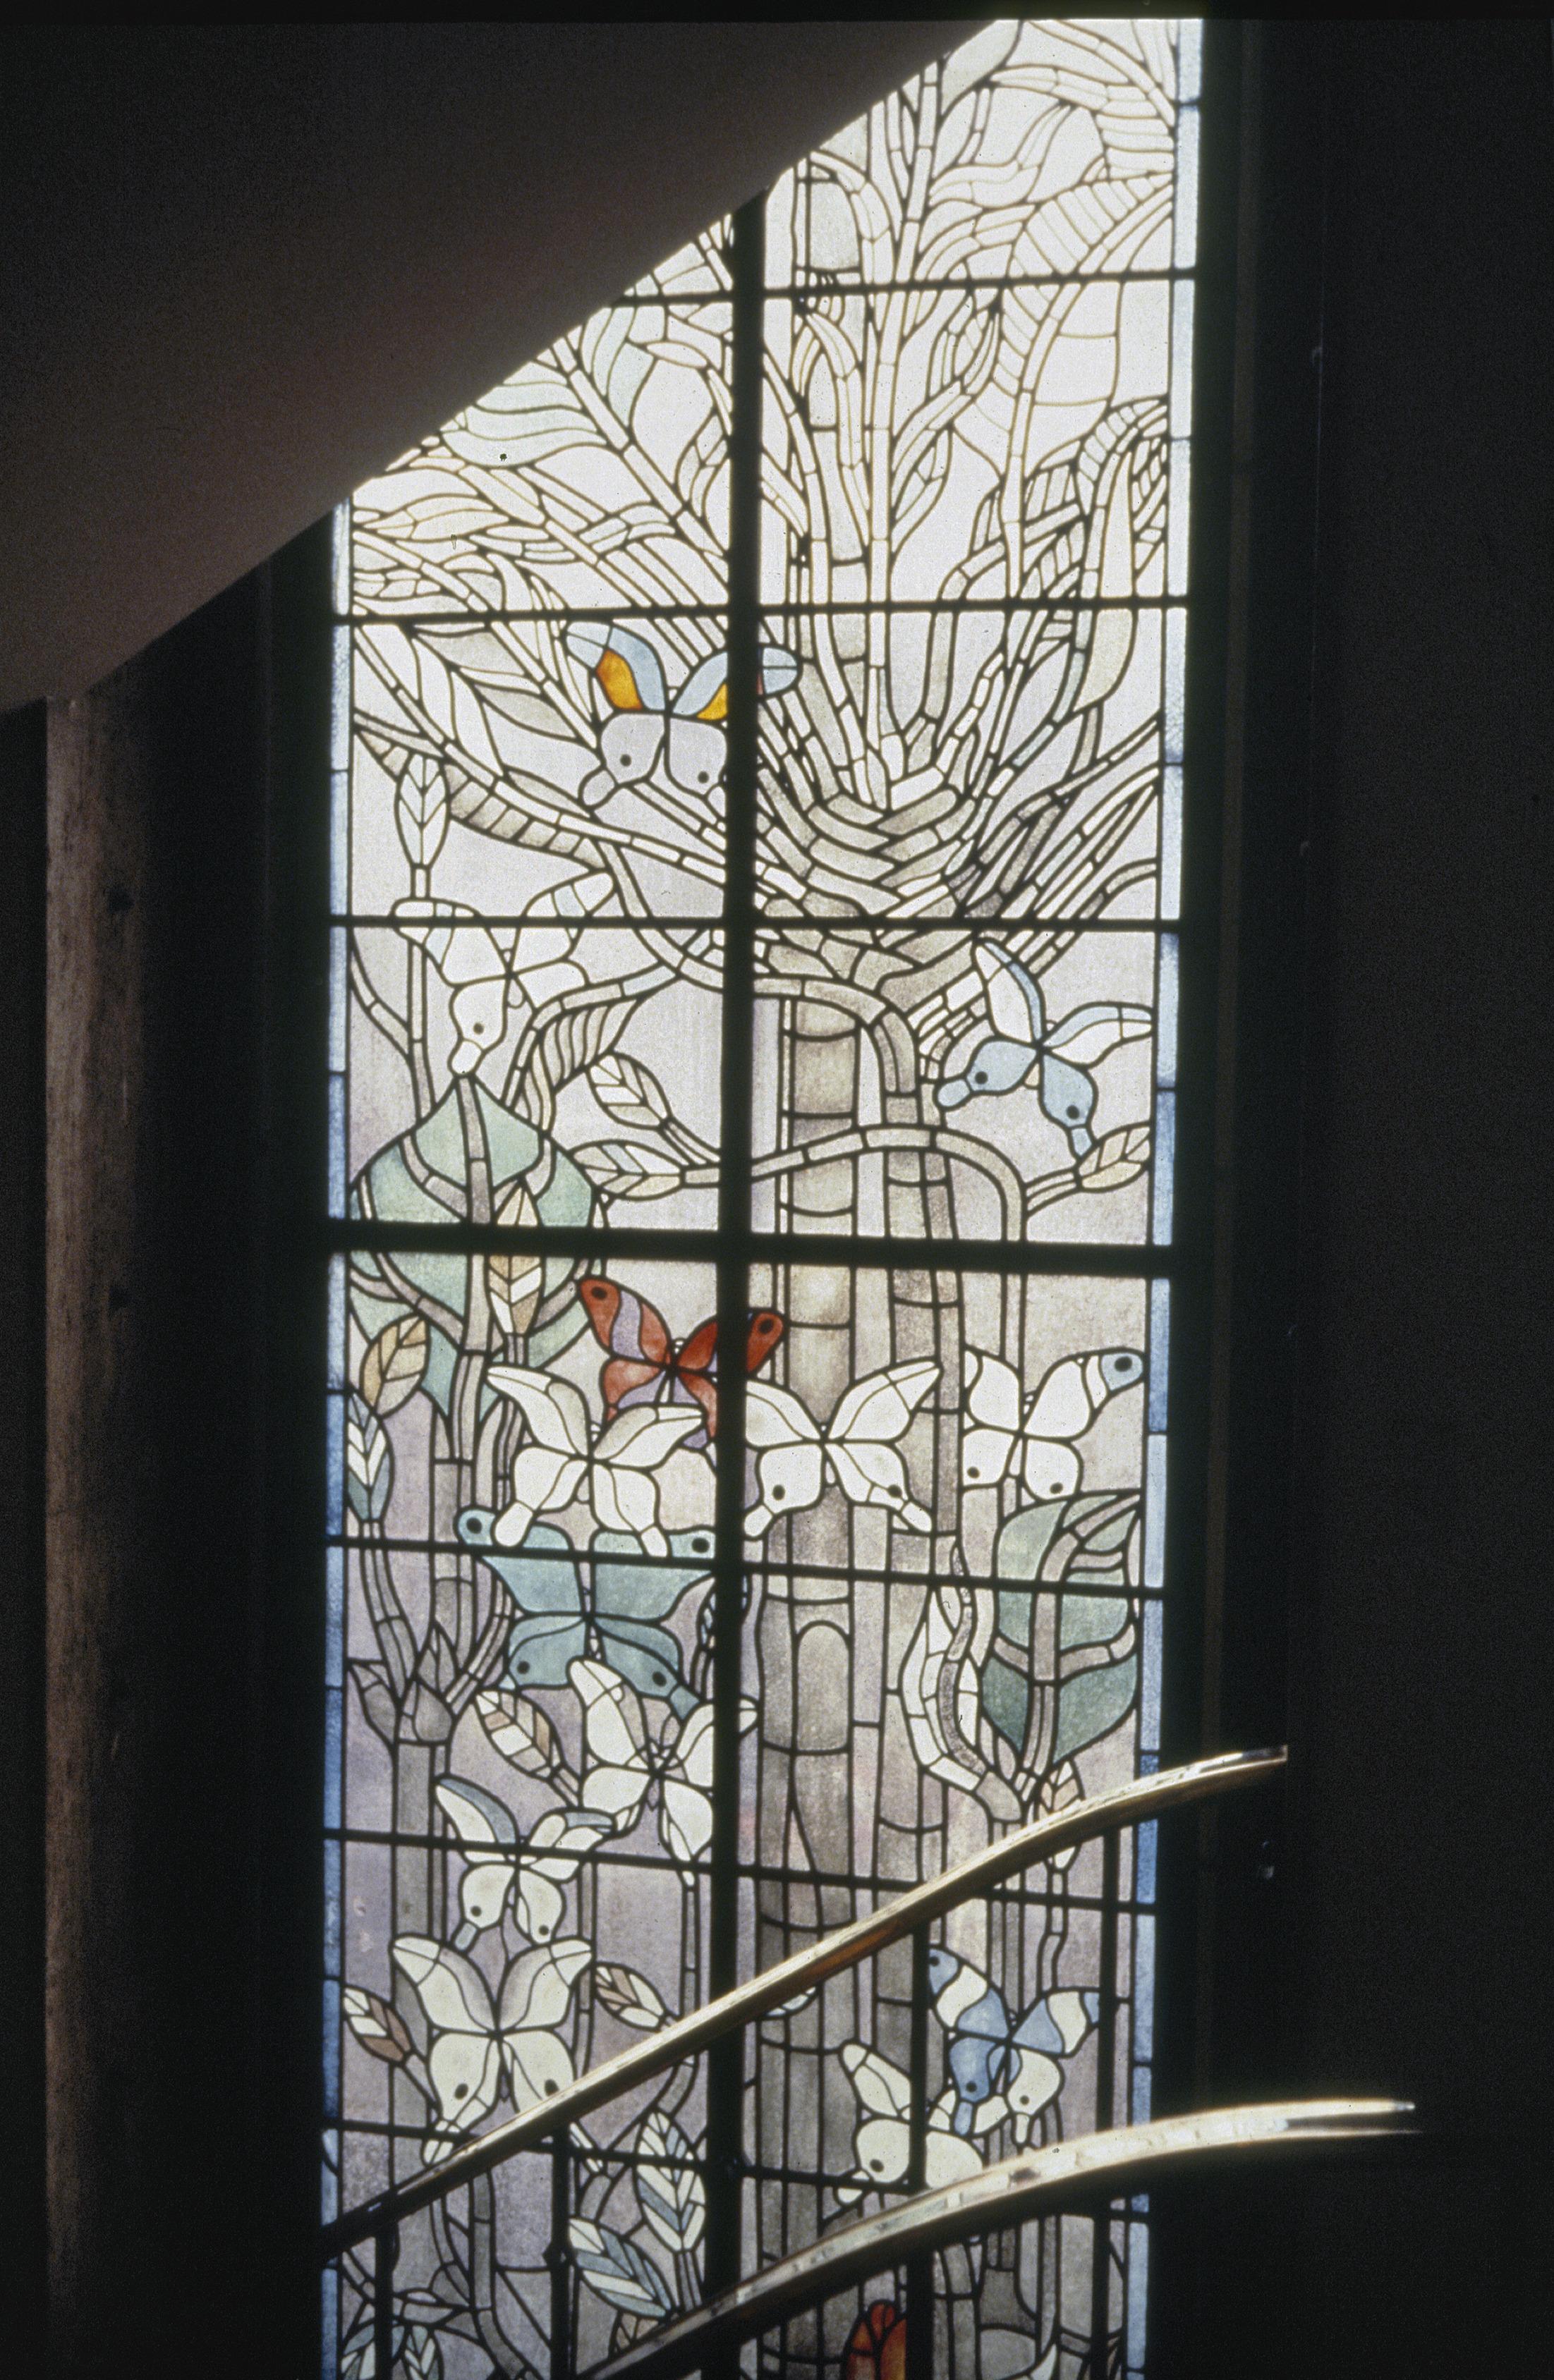 datei interieur trappenhuis gebrandschilderd glas in loodraam amsterdam 20366320. Black Bedroom Furniture Sets. Home Design Ideas